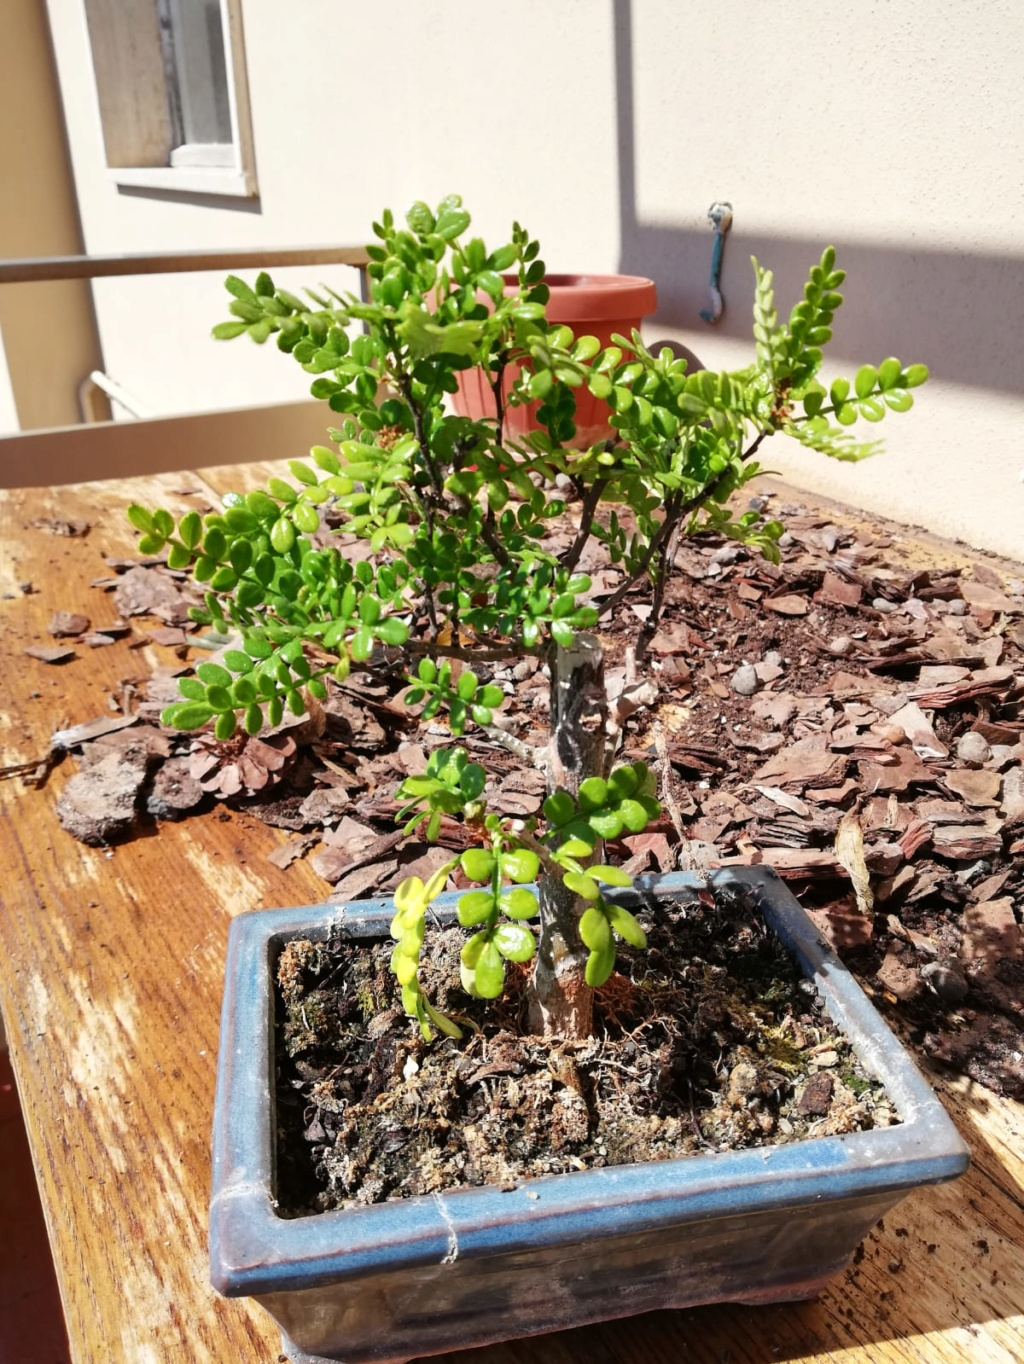 Il mio primo bonsai (pepe?) Whatsa11